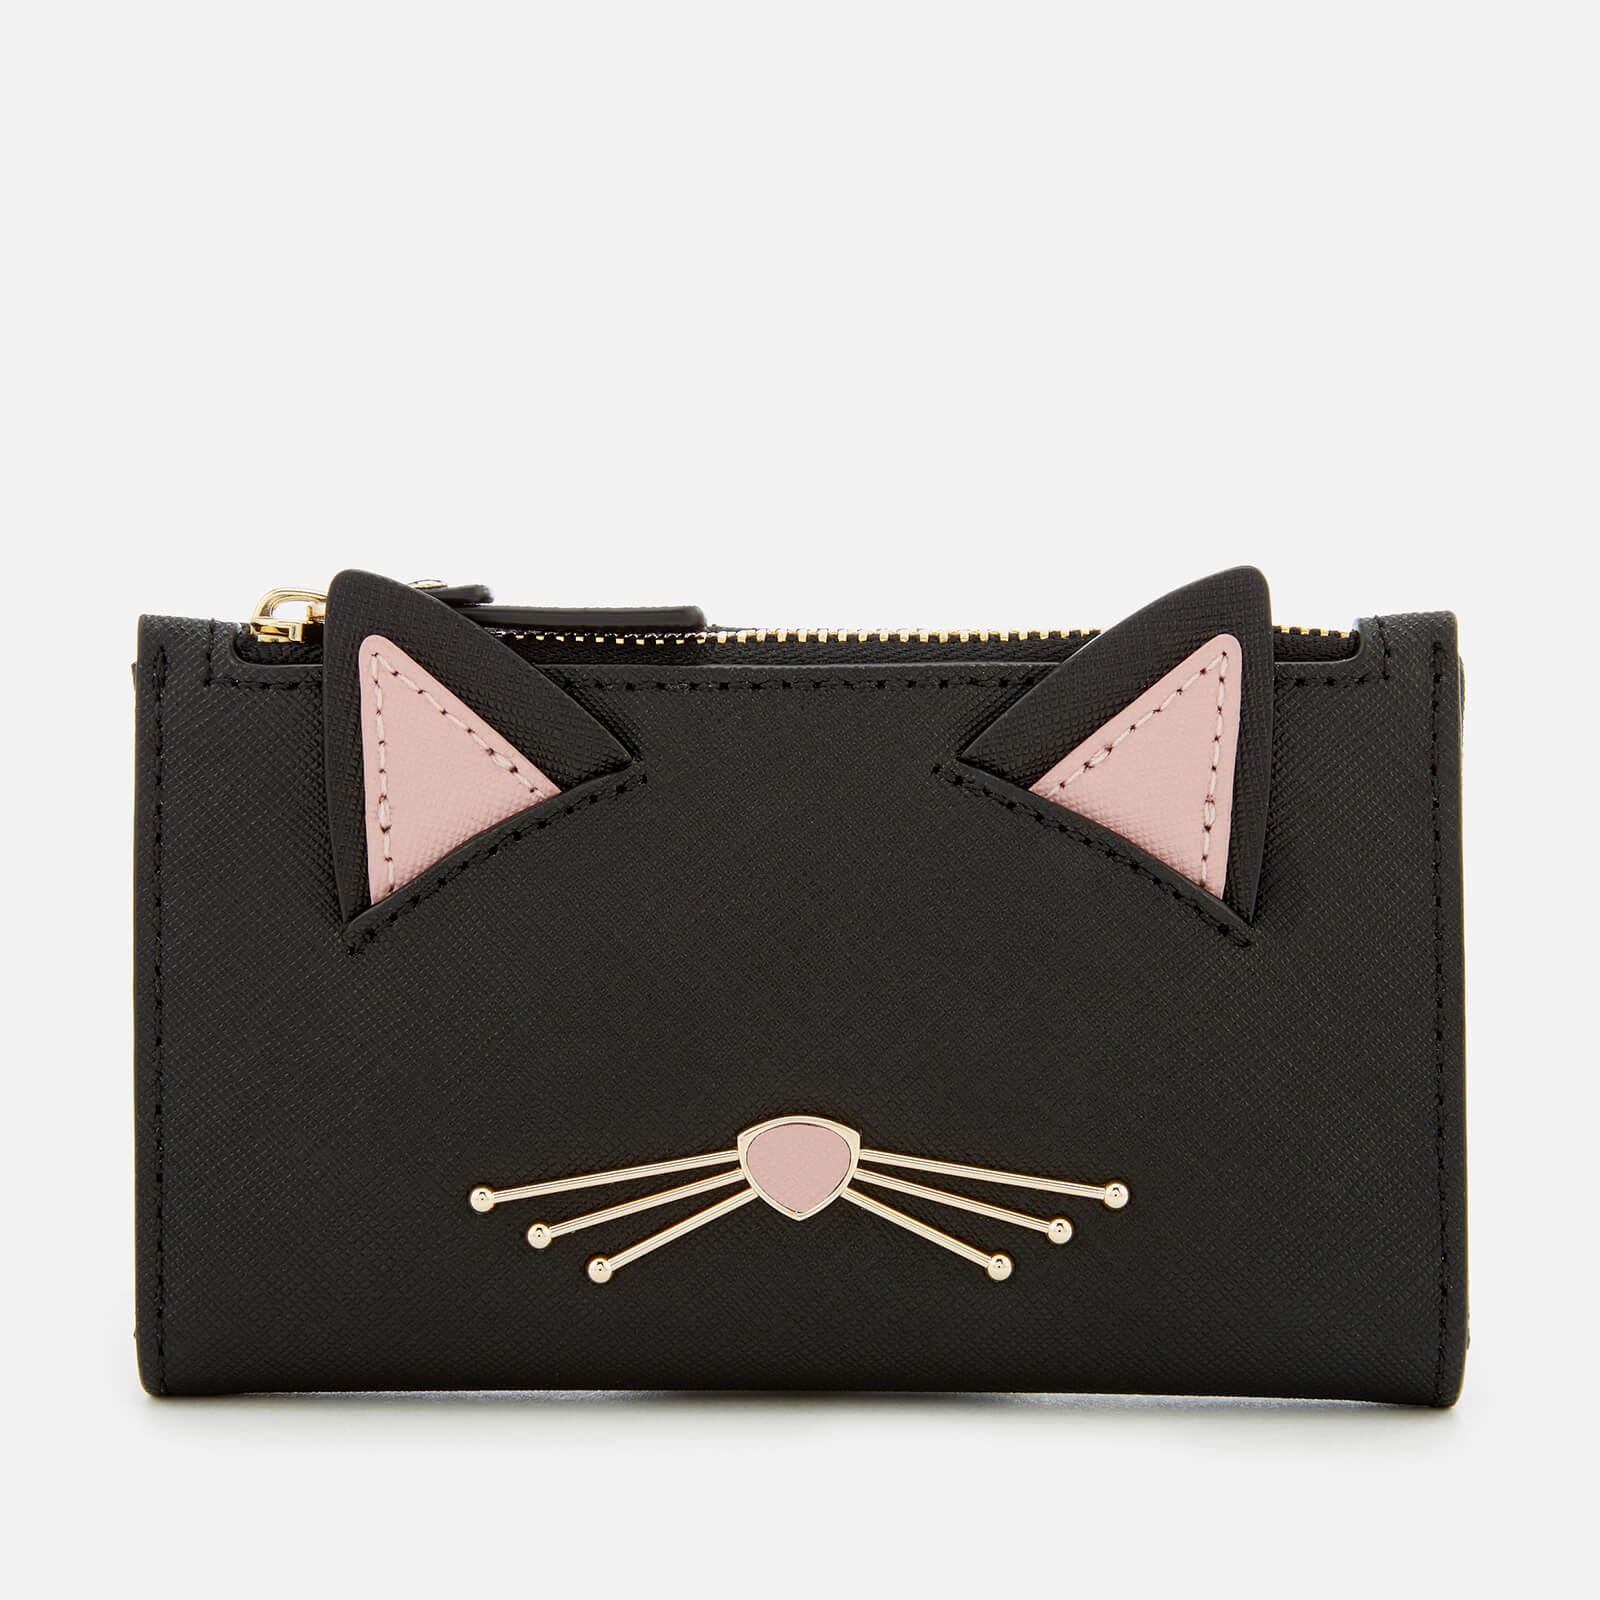 online retailer e9404 5c253 Kate Spade New York Women's Cat Mikey Wallet - Black Multi